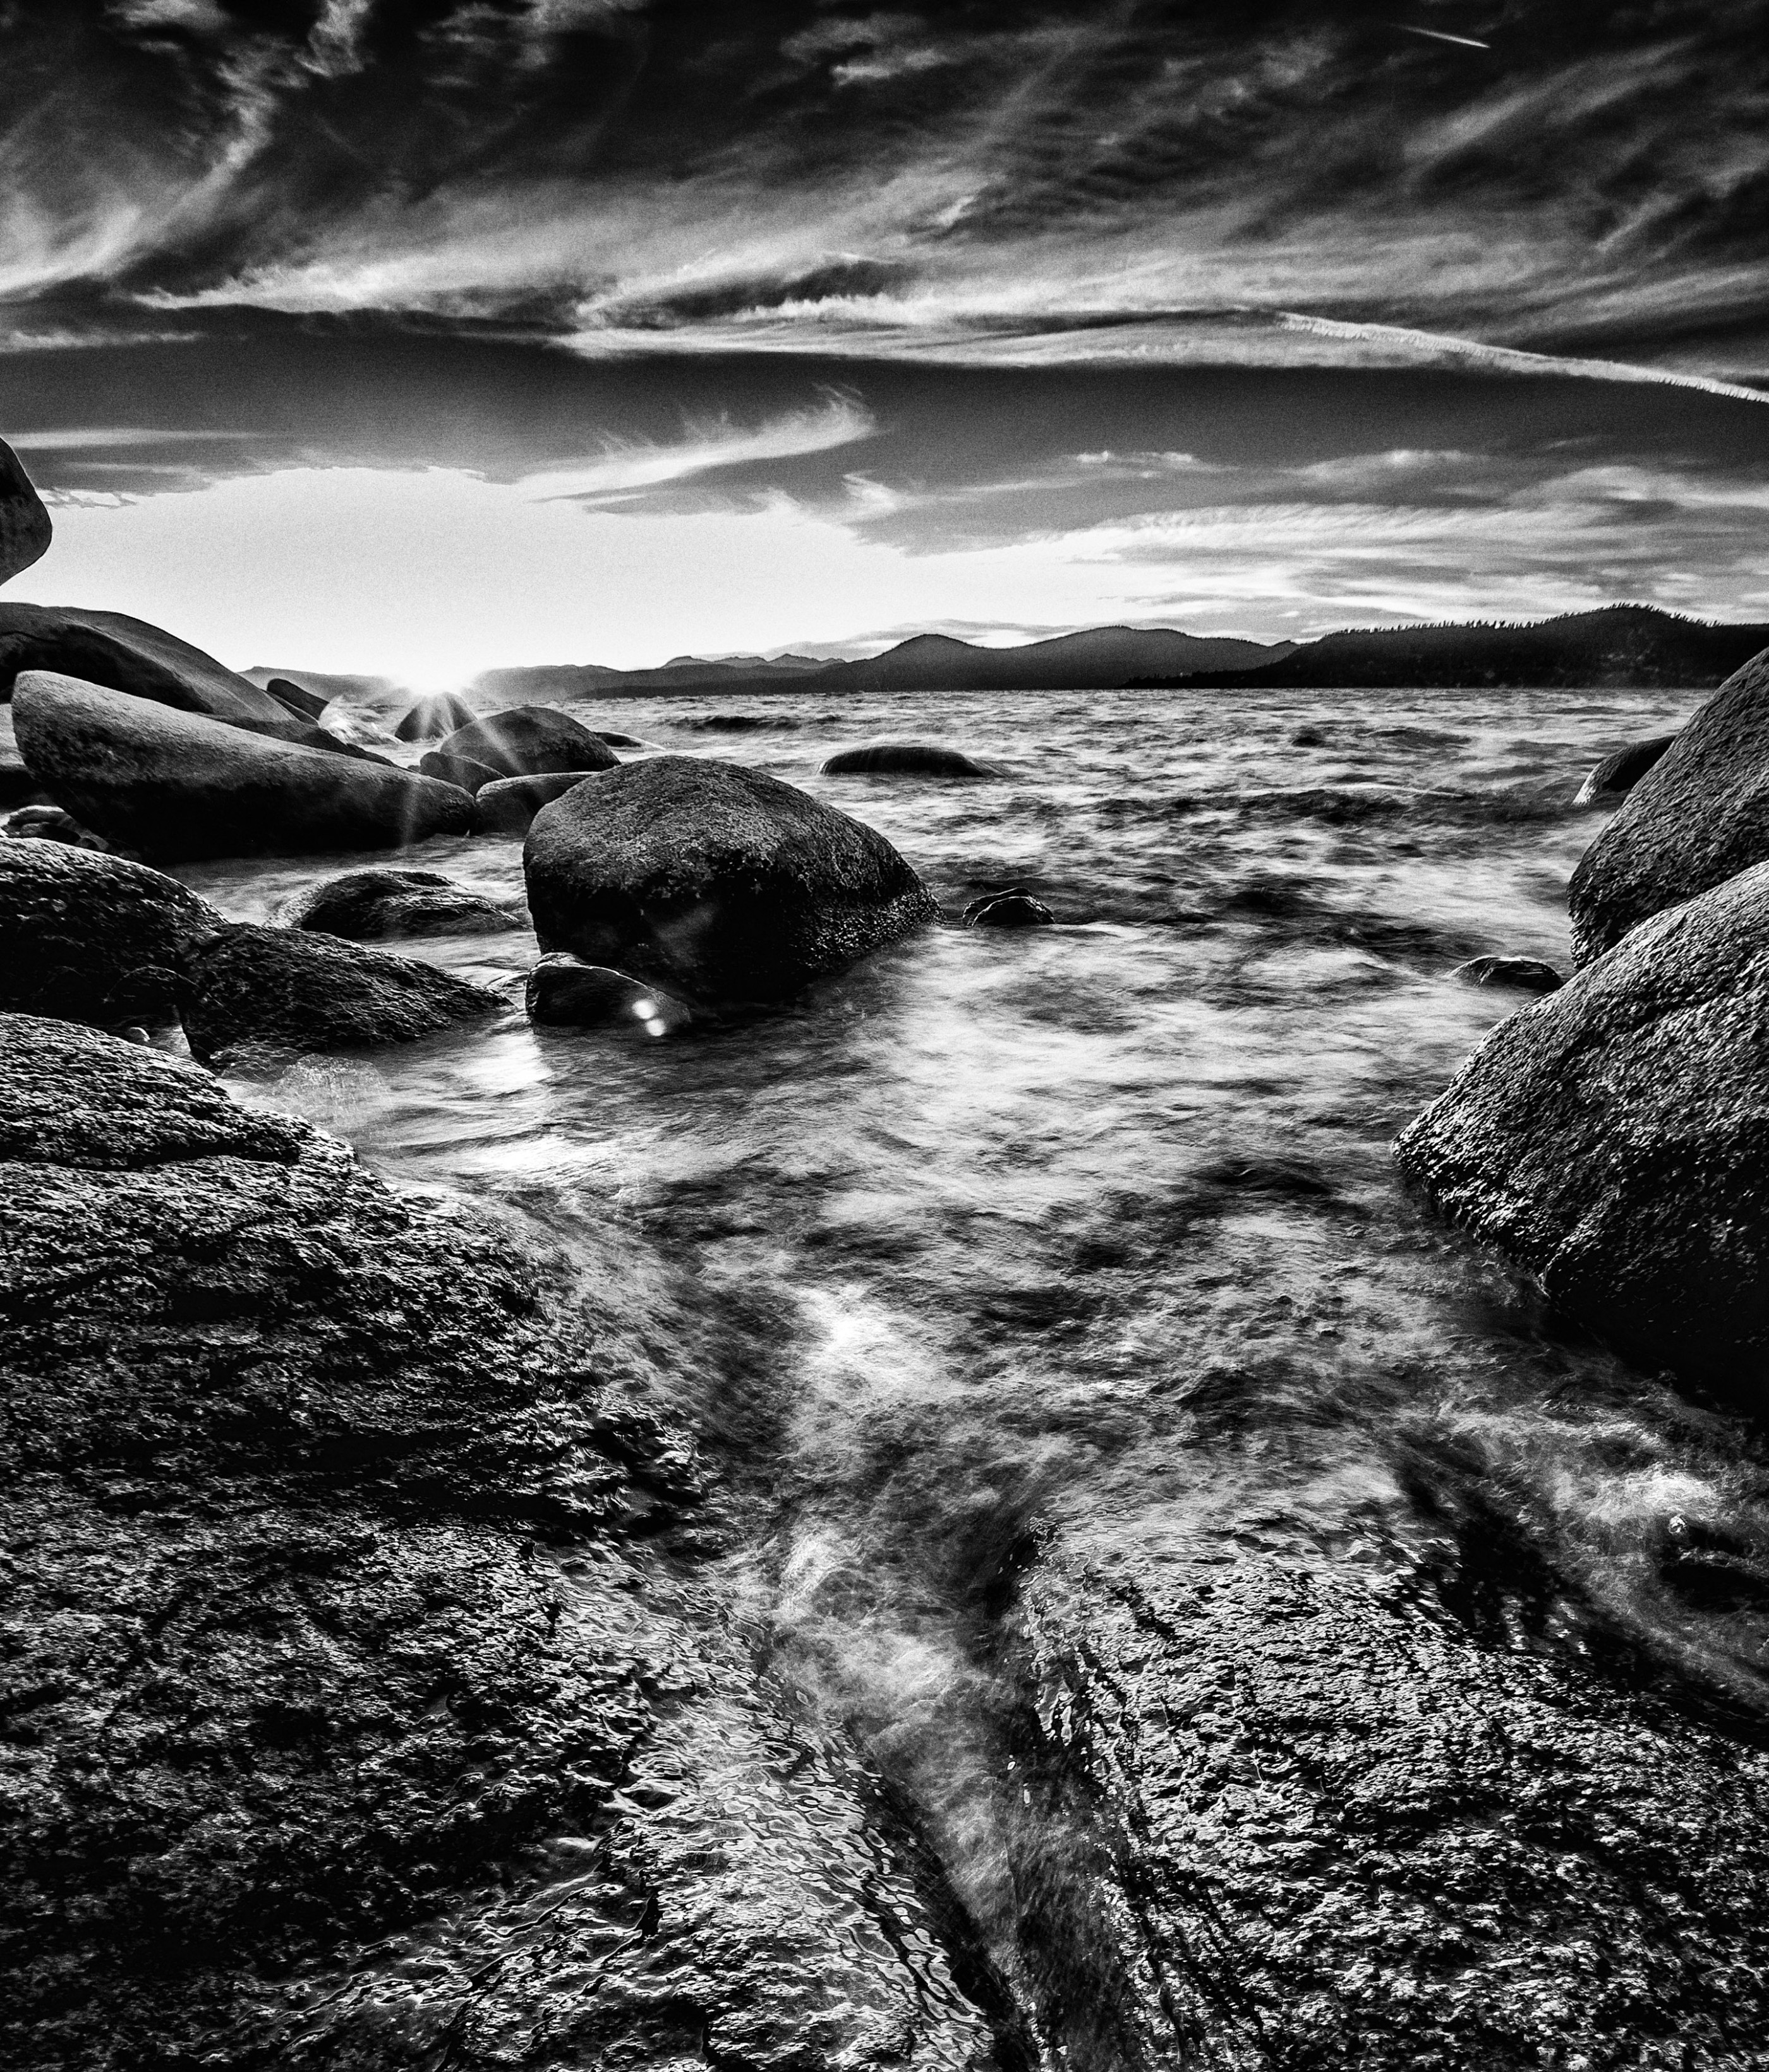 Lake Tahoe 2014 by Ash Newell